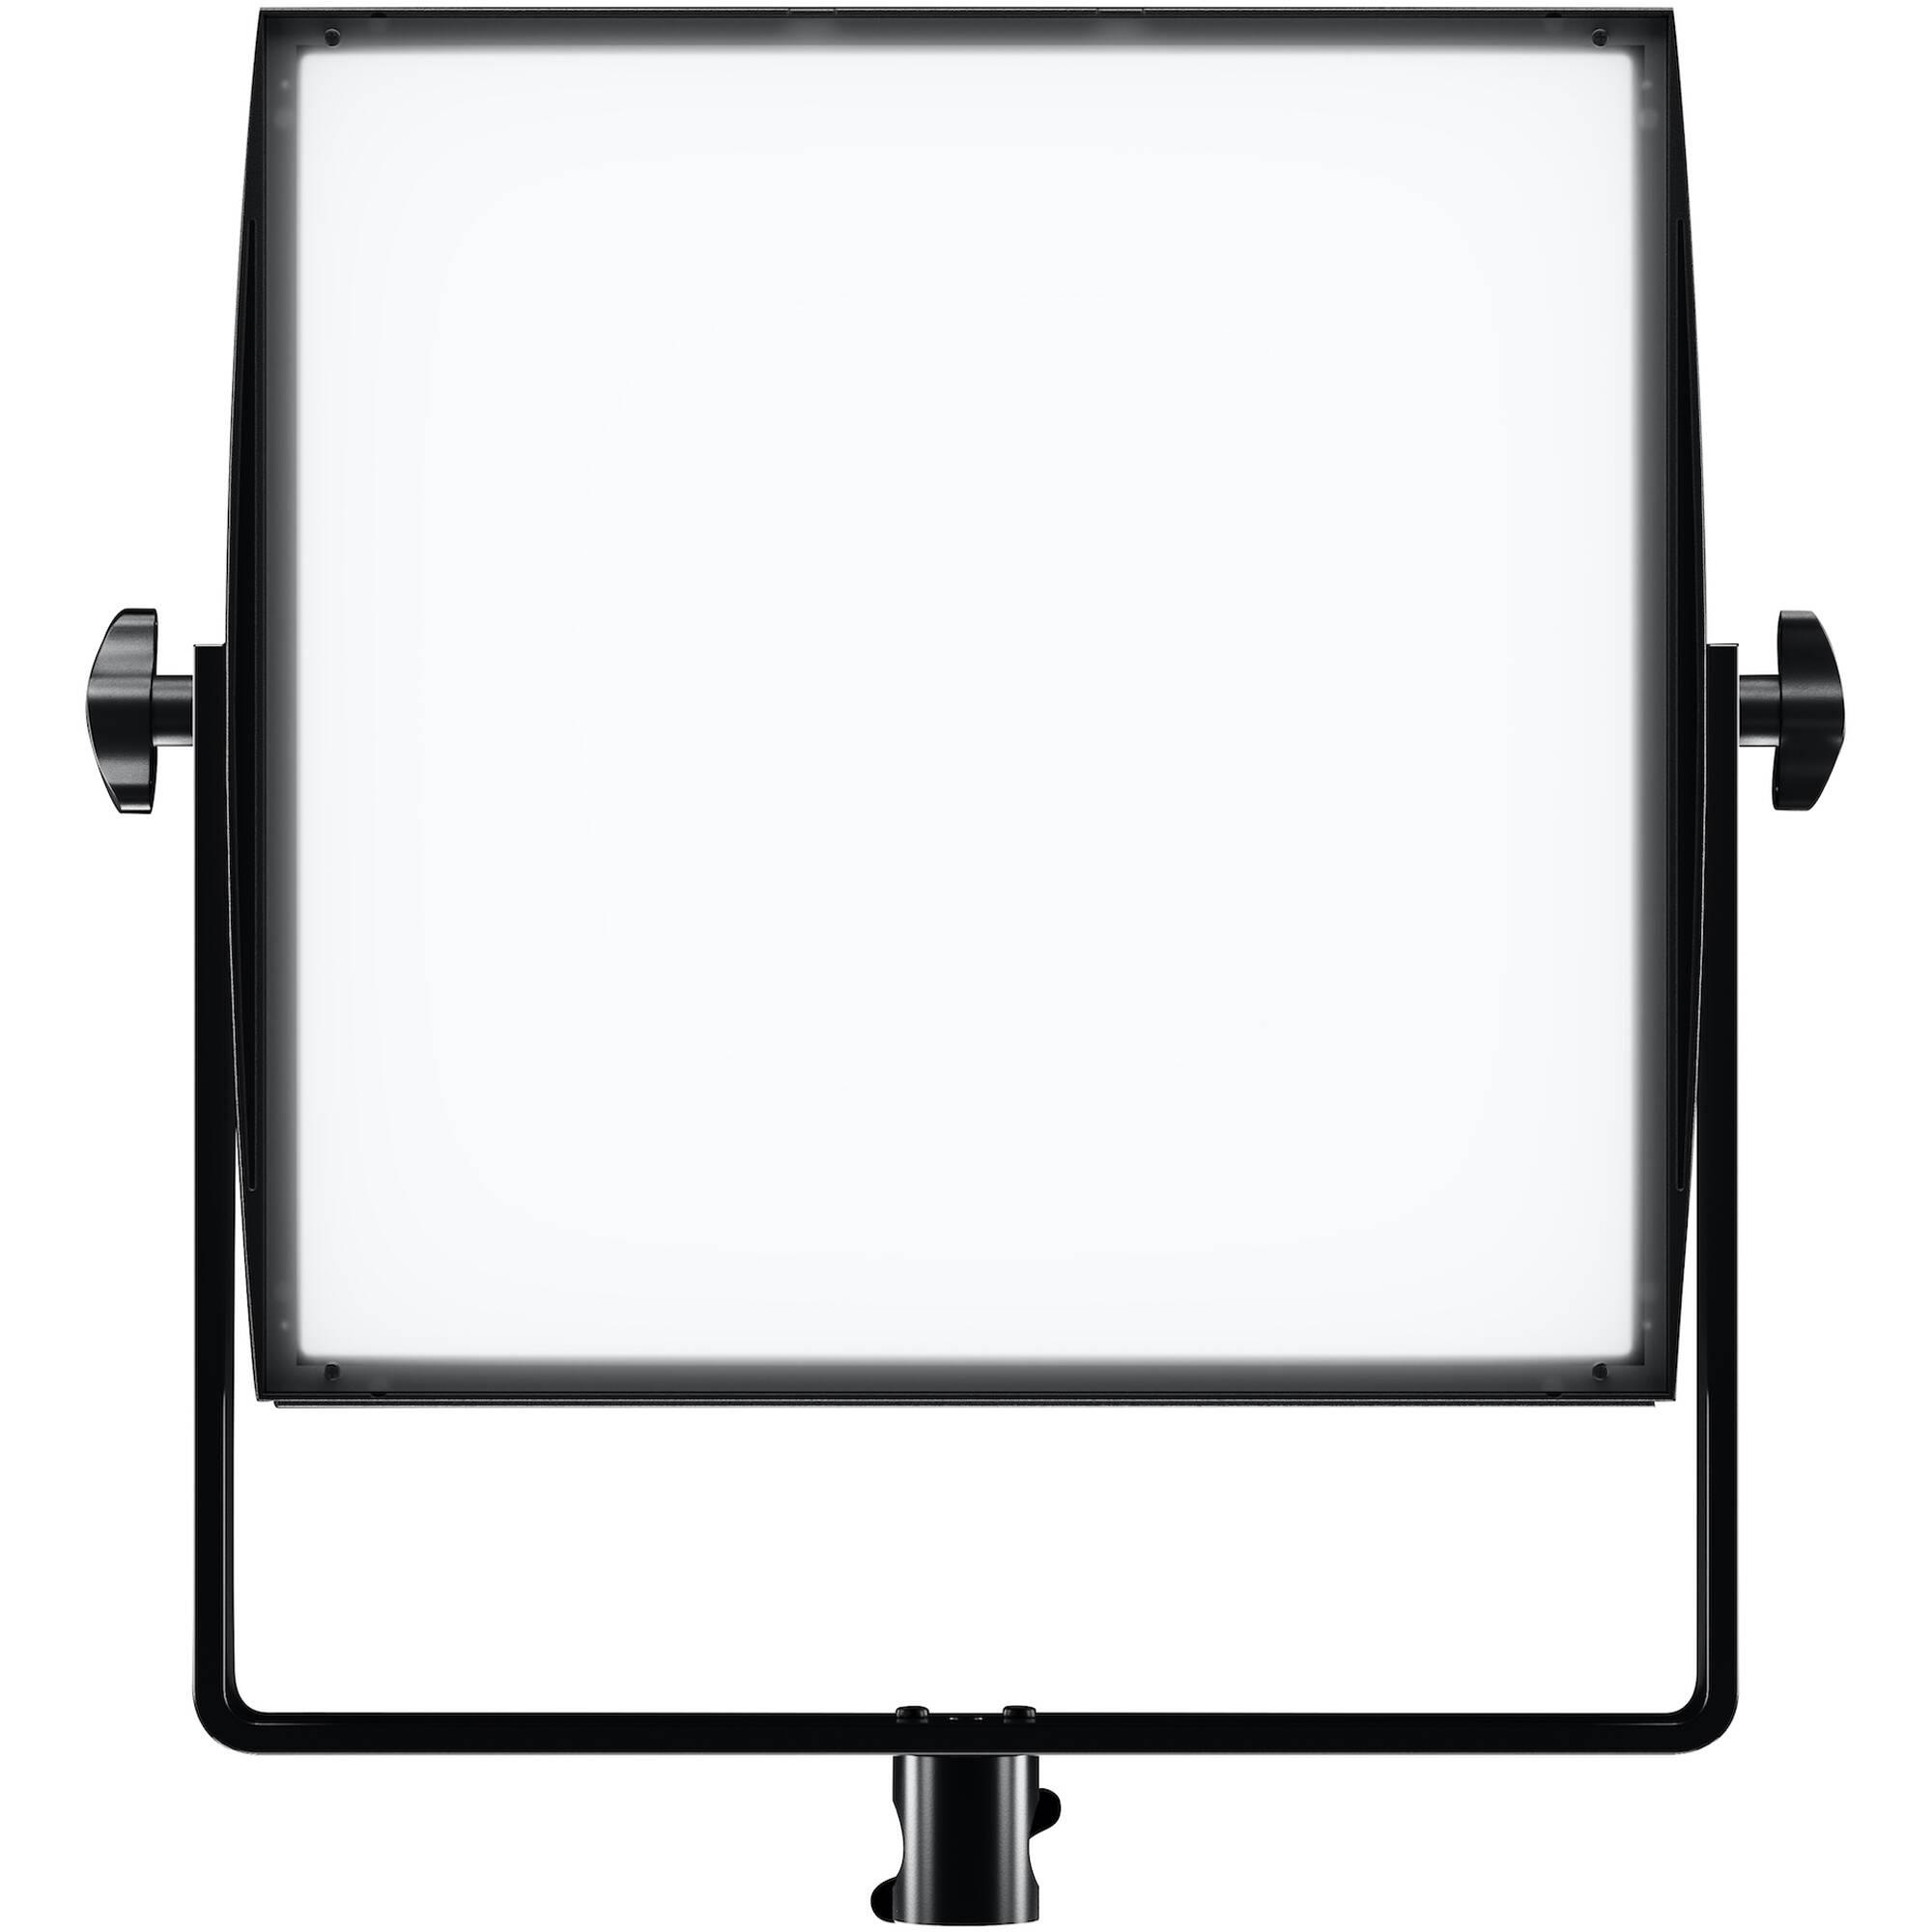 lupo superpanel 1x1 39 full color 30 rgbw led panel 415 b h photo. Black Bedroom Furniture Sets. Home Design Ideas